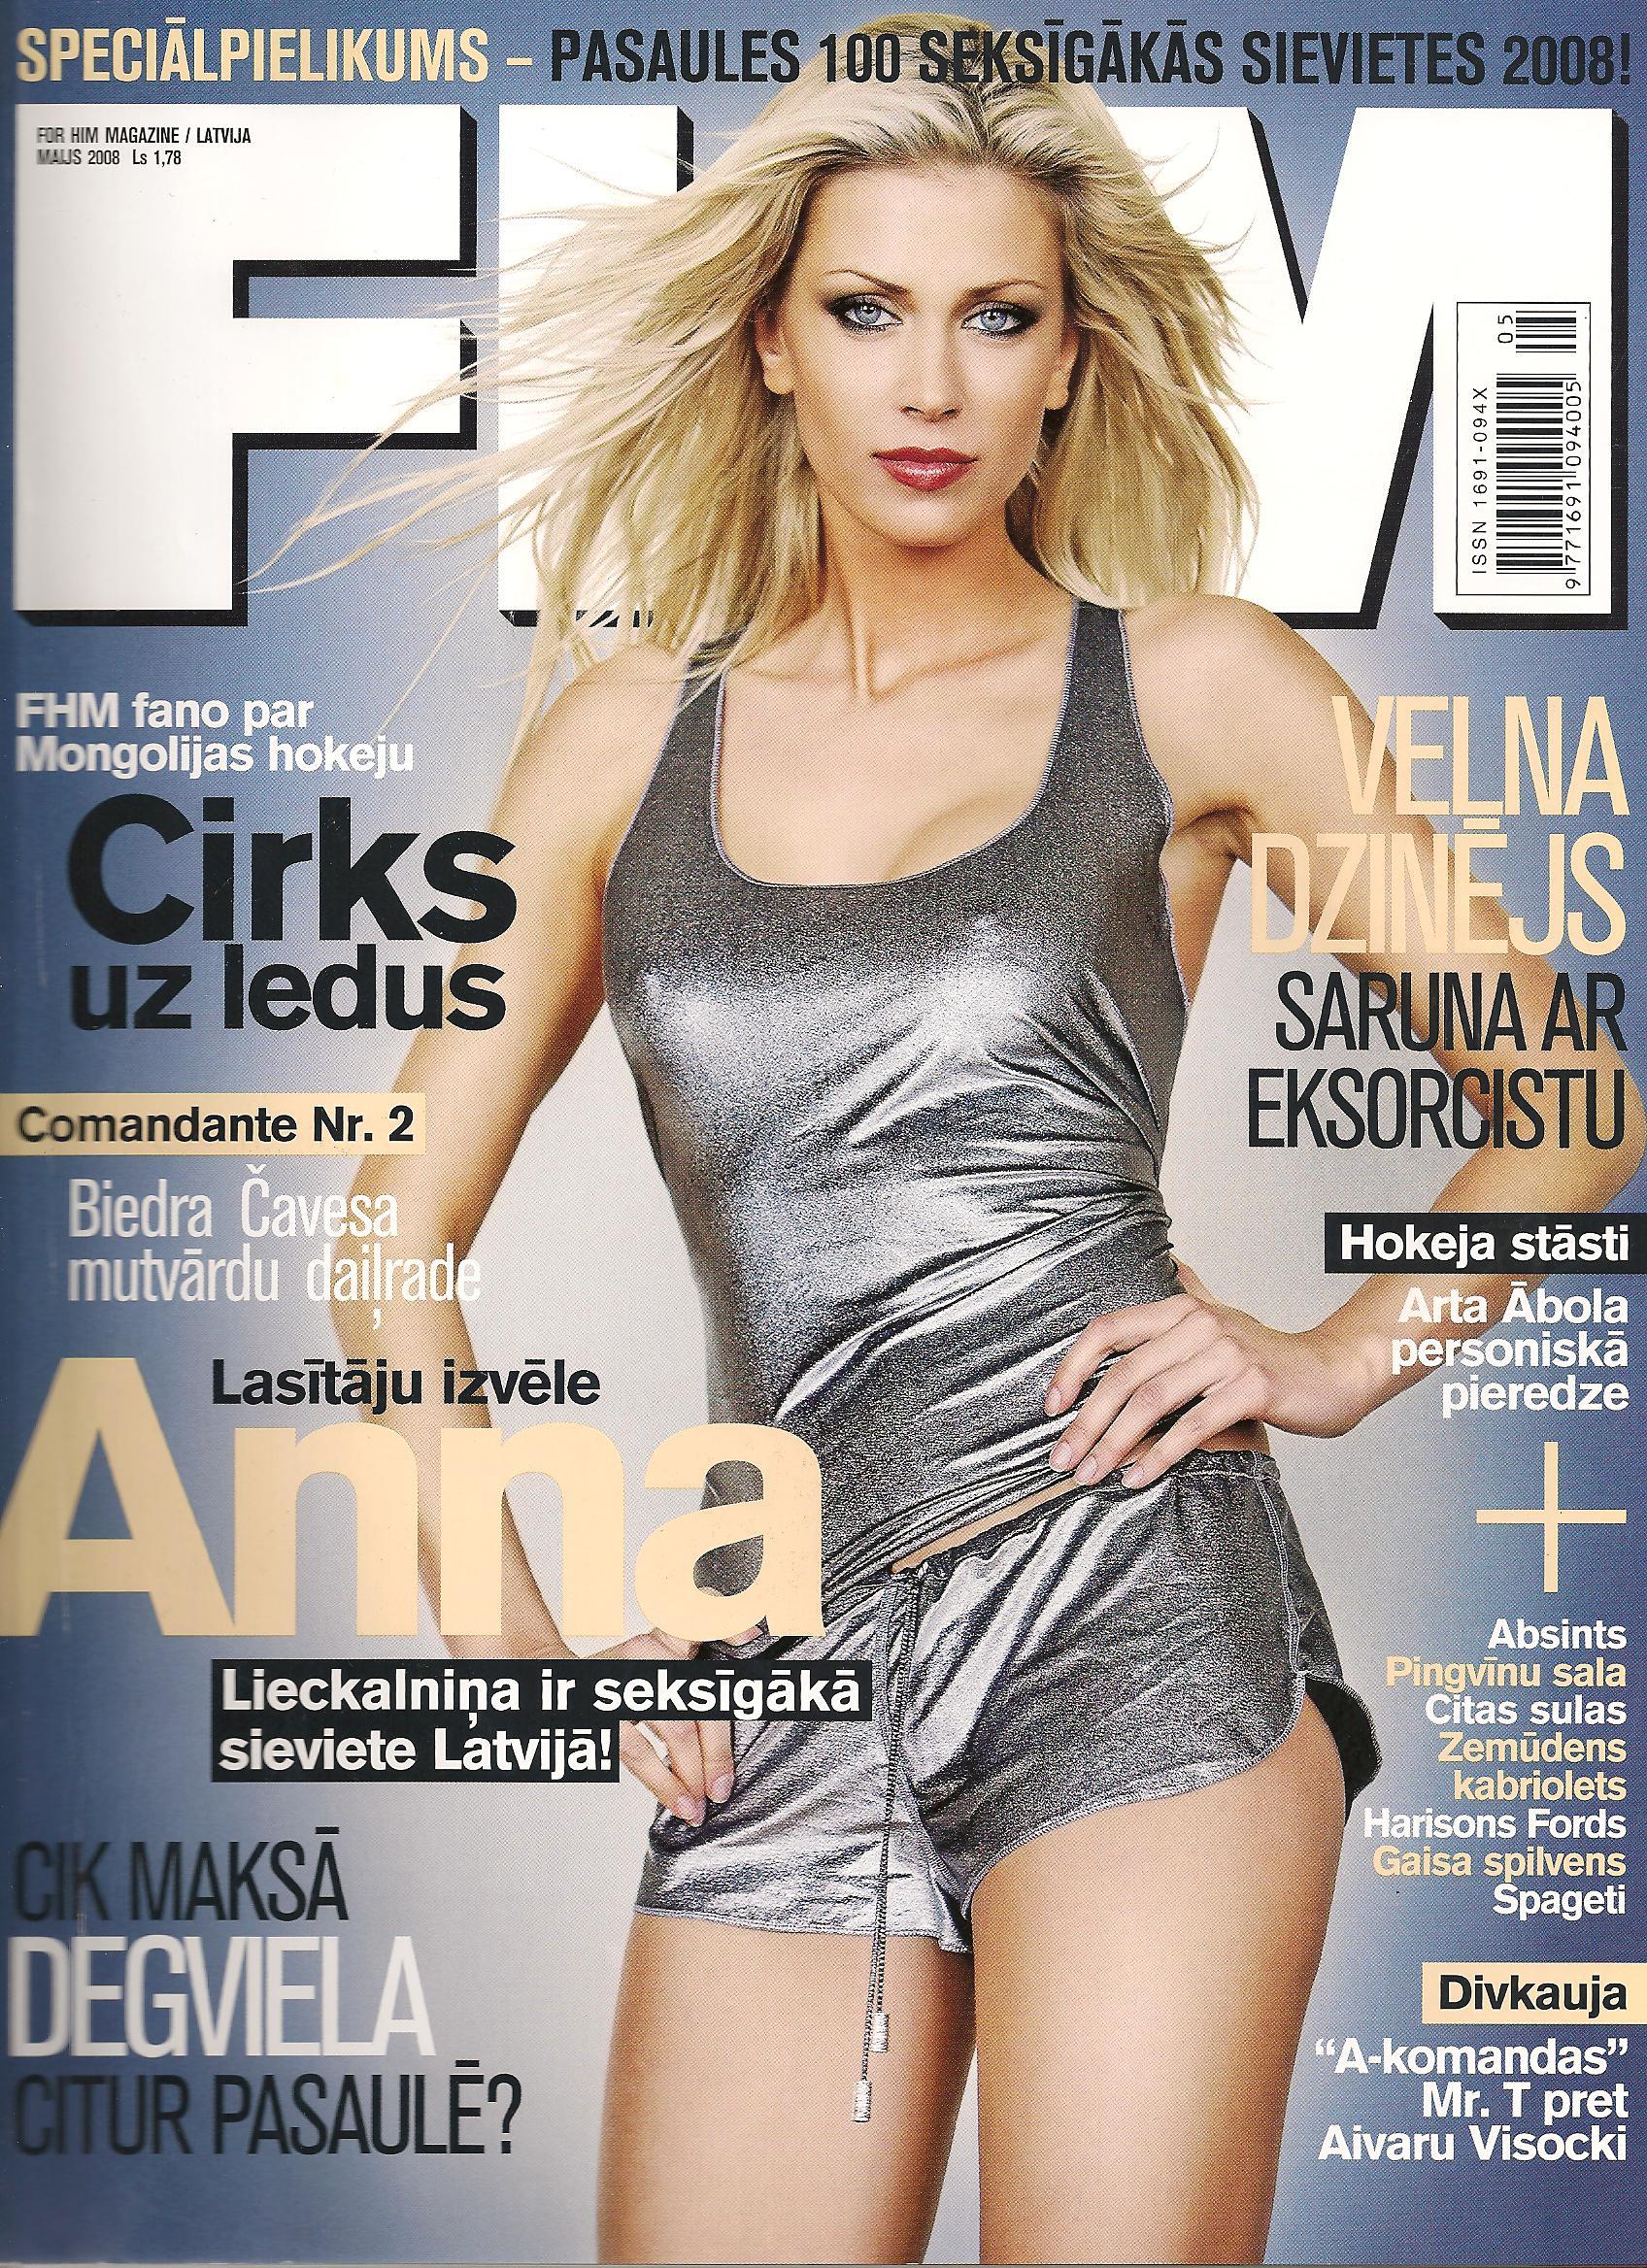 Anna Lieckalniņa, FHM